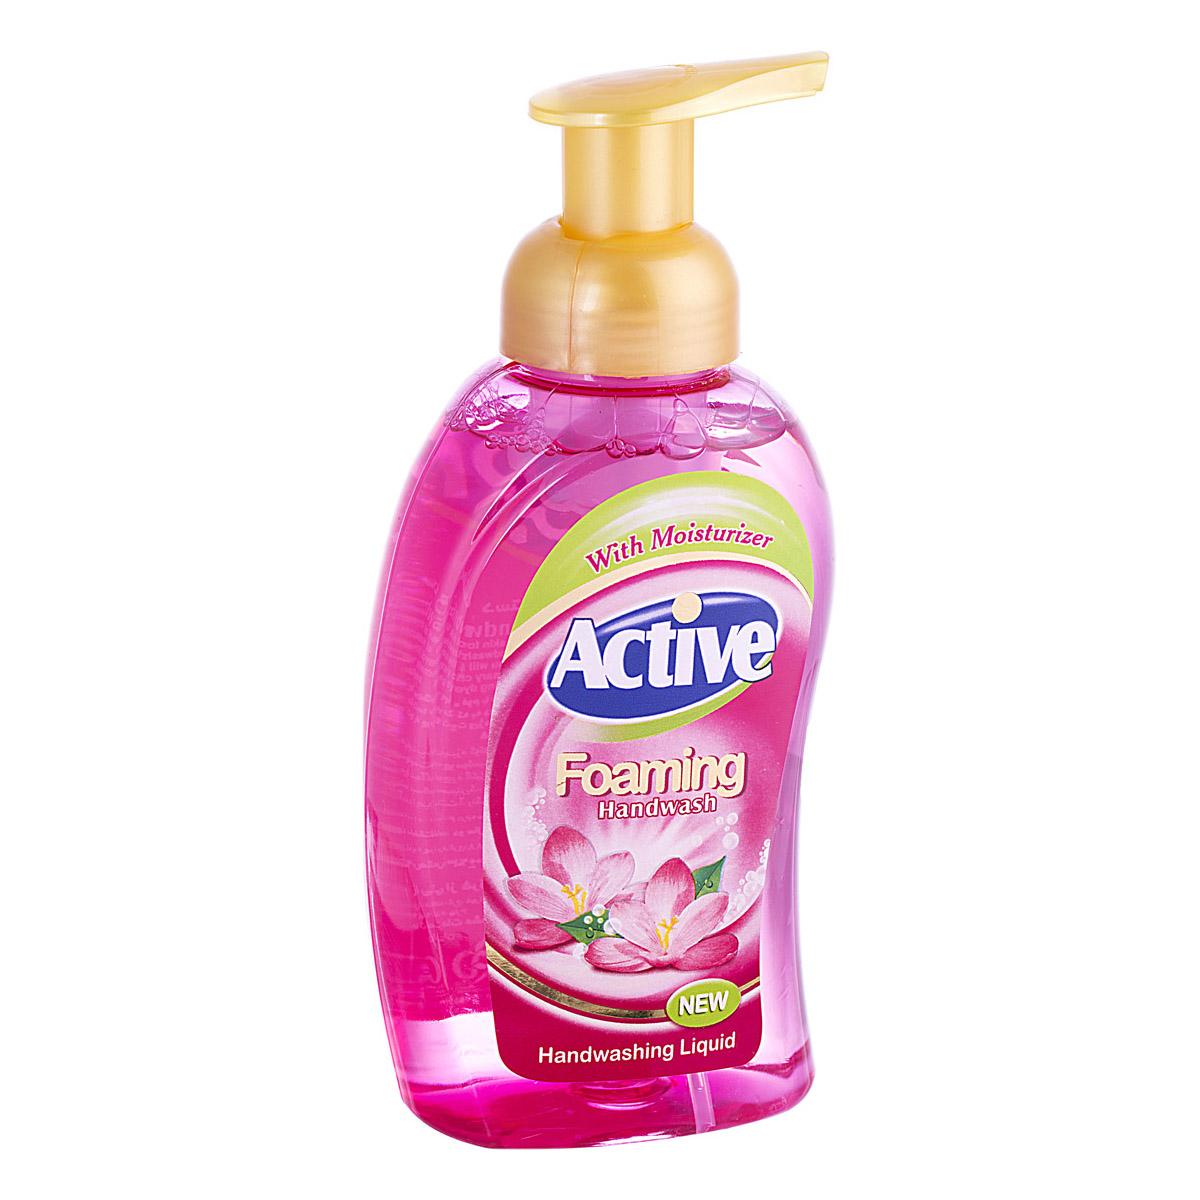 مایع دستشویی فوم اکتیو